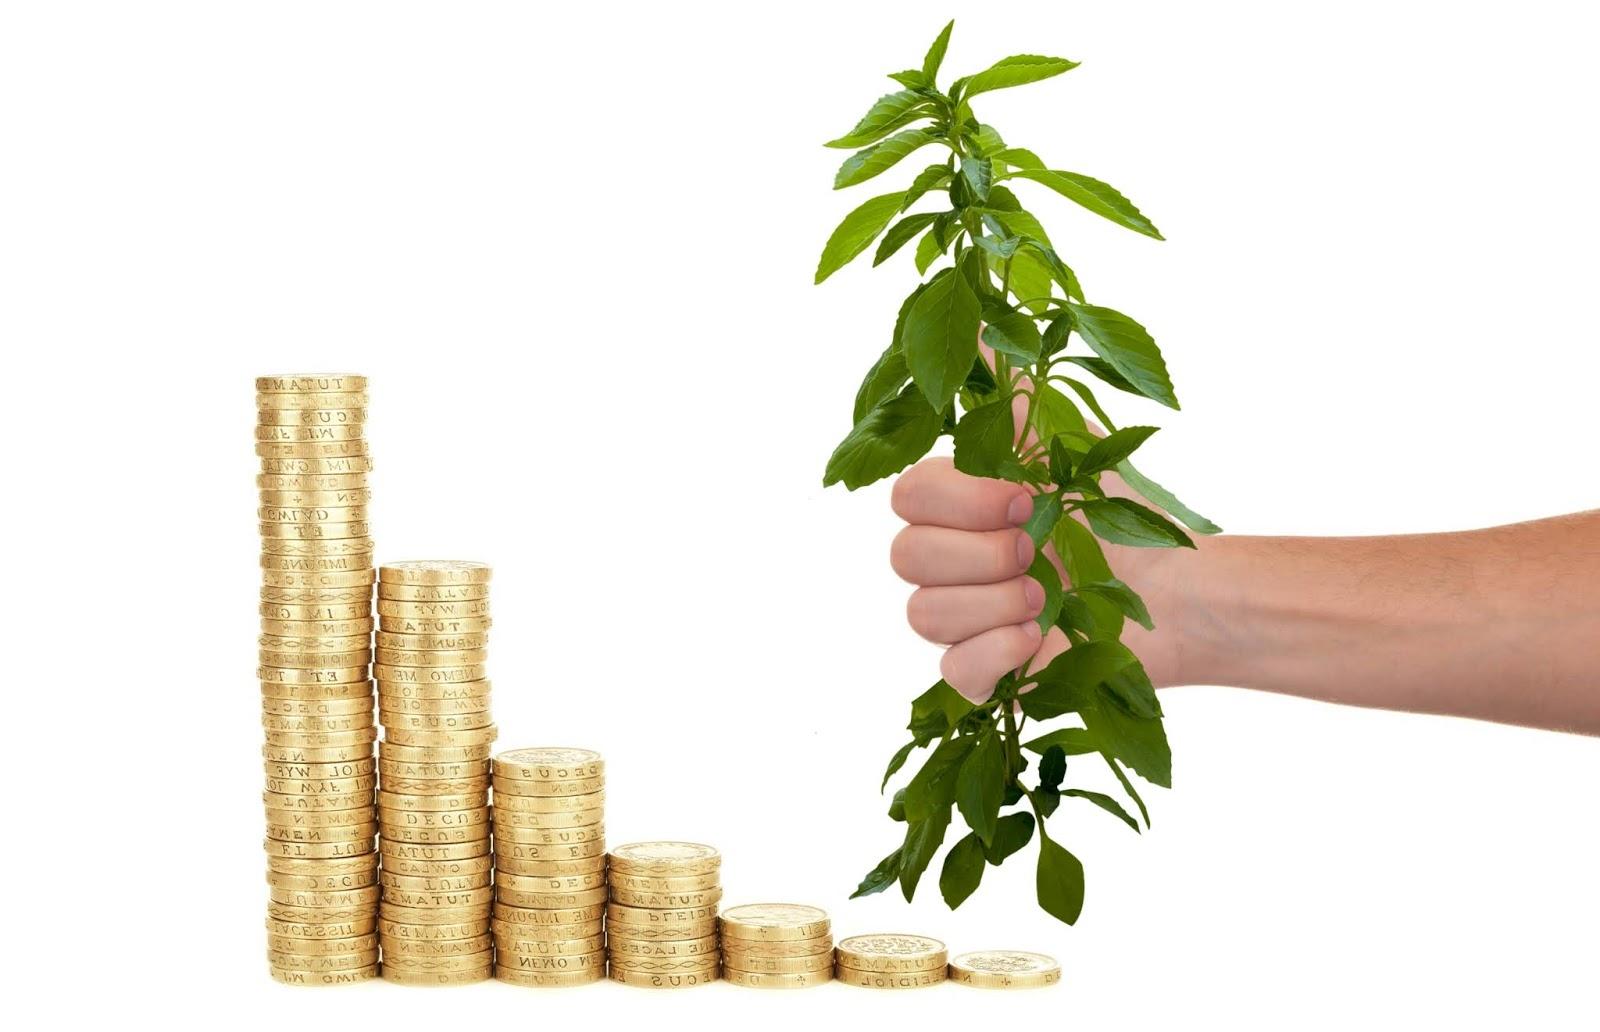 Investment money tree image